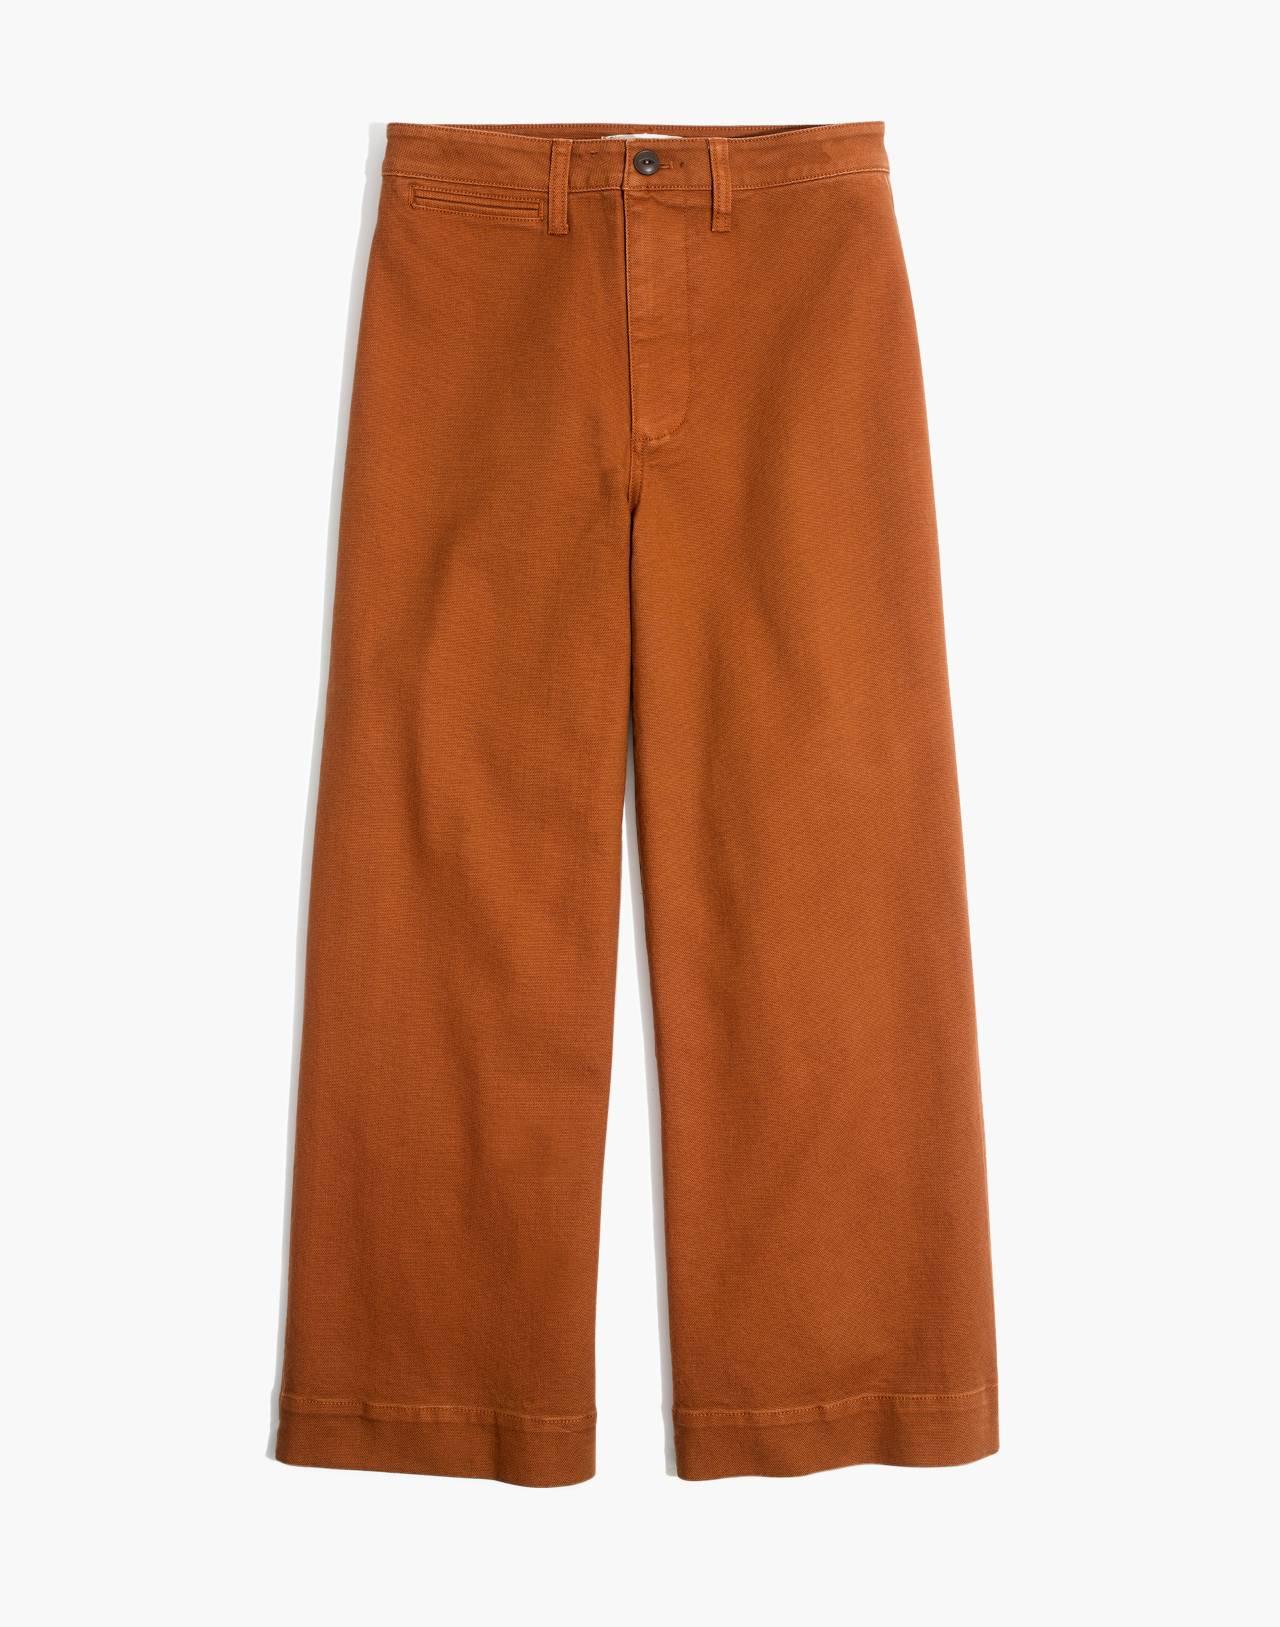 Emmett Wide-Leg Crop Pants in burnt sienna image 4